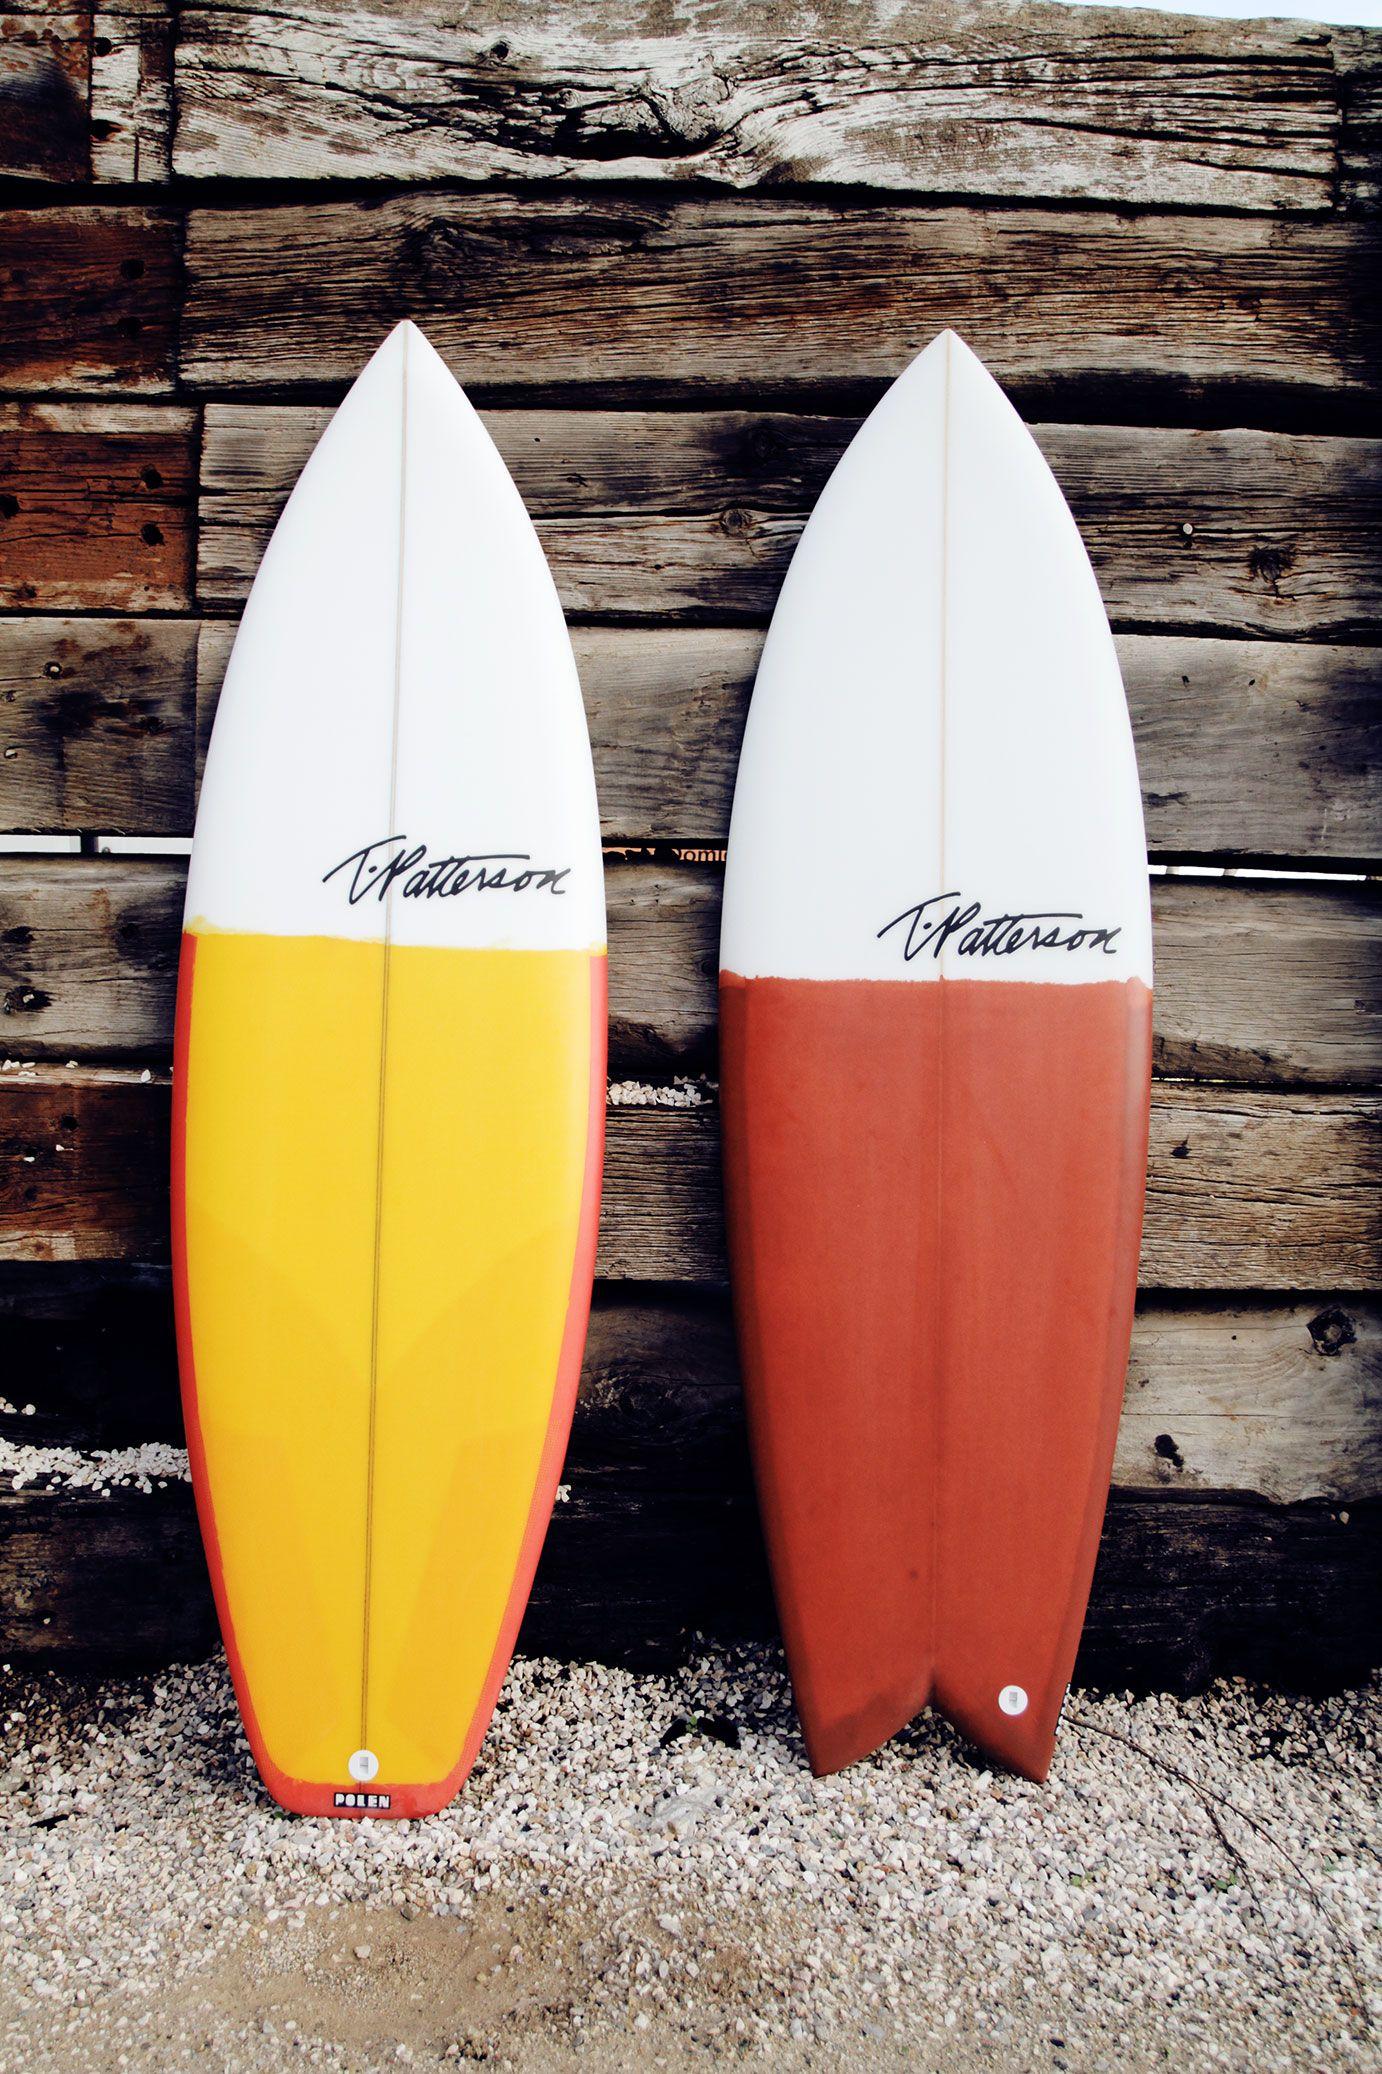 Tim Patterson Surfboards, Custom & Devilfish Made At Polen Surfboards